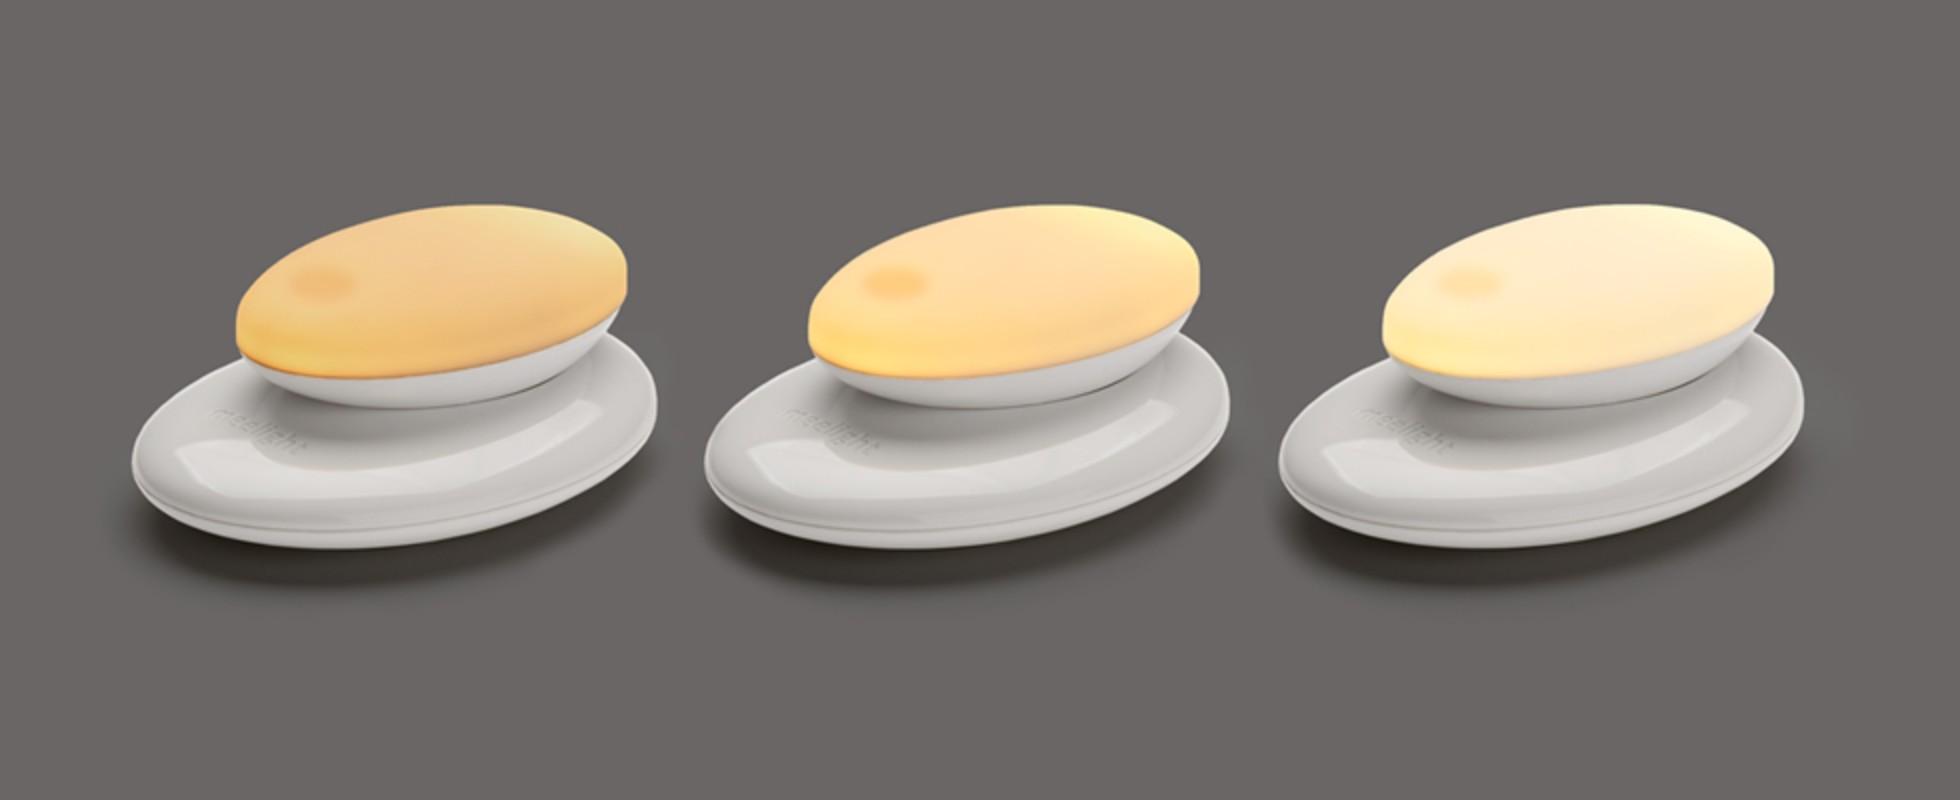 Veilleuse portative Meelight Meemoobaby différentes luminosités